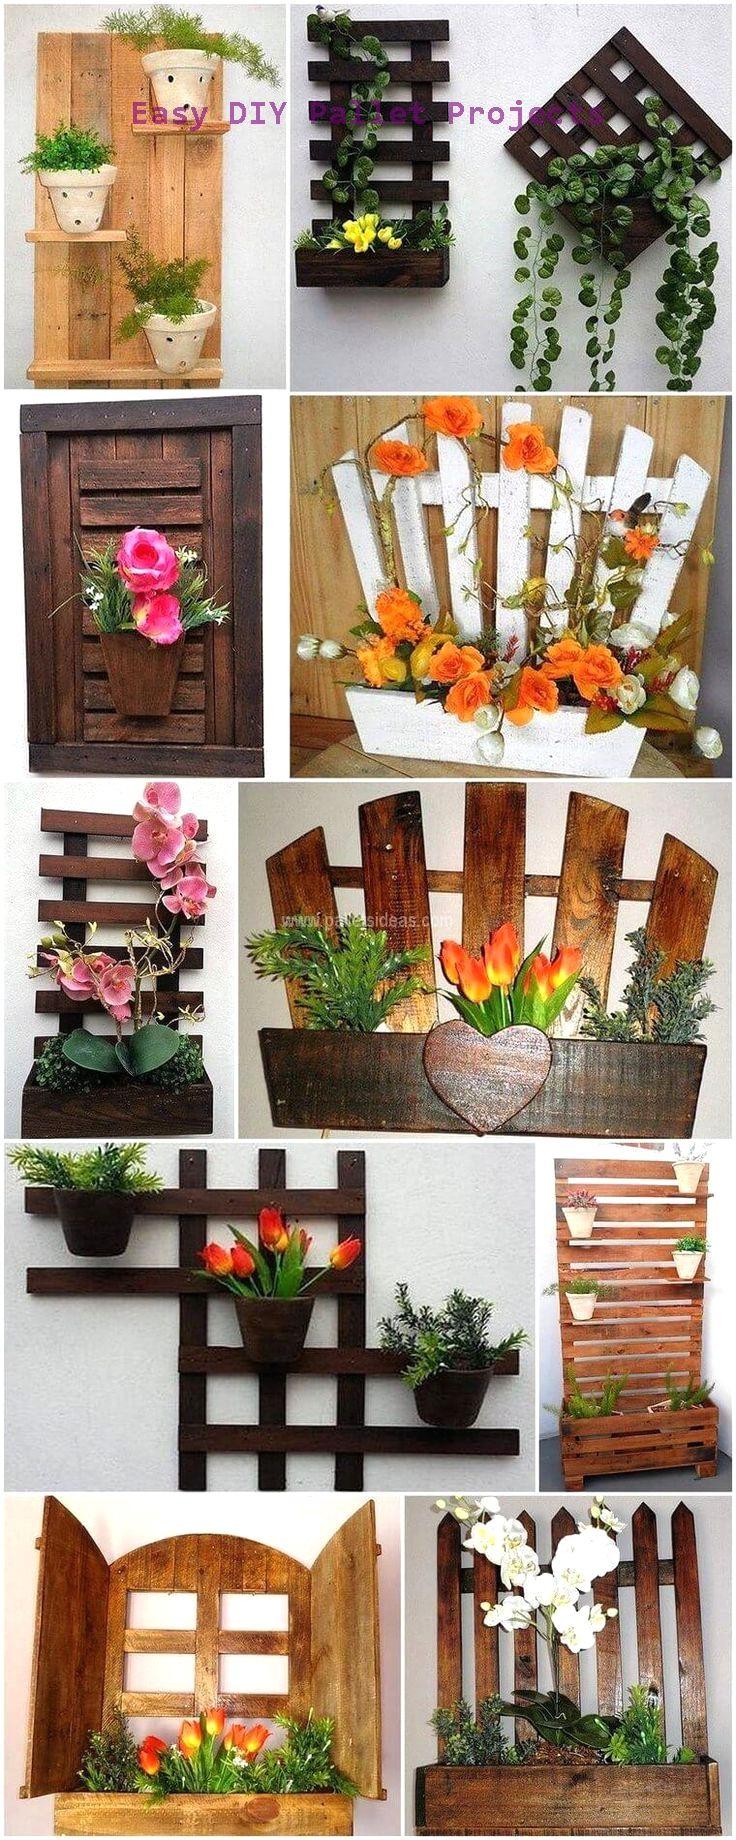 Diy Ideas Using Wood Pallets Pallet Diy Pallet Projects Garden Diy Wall Planter